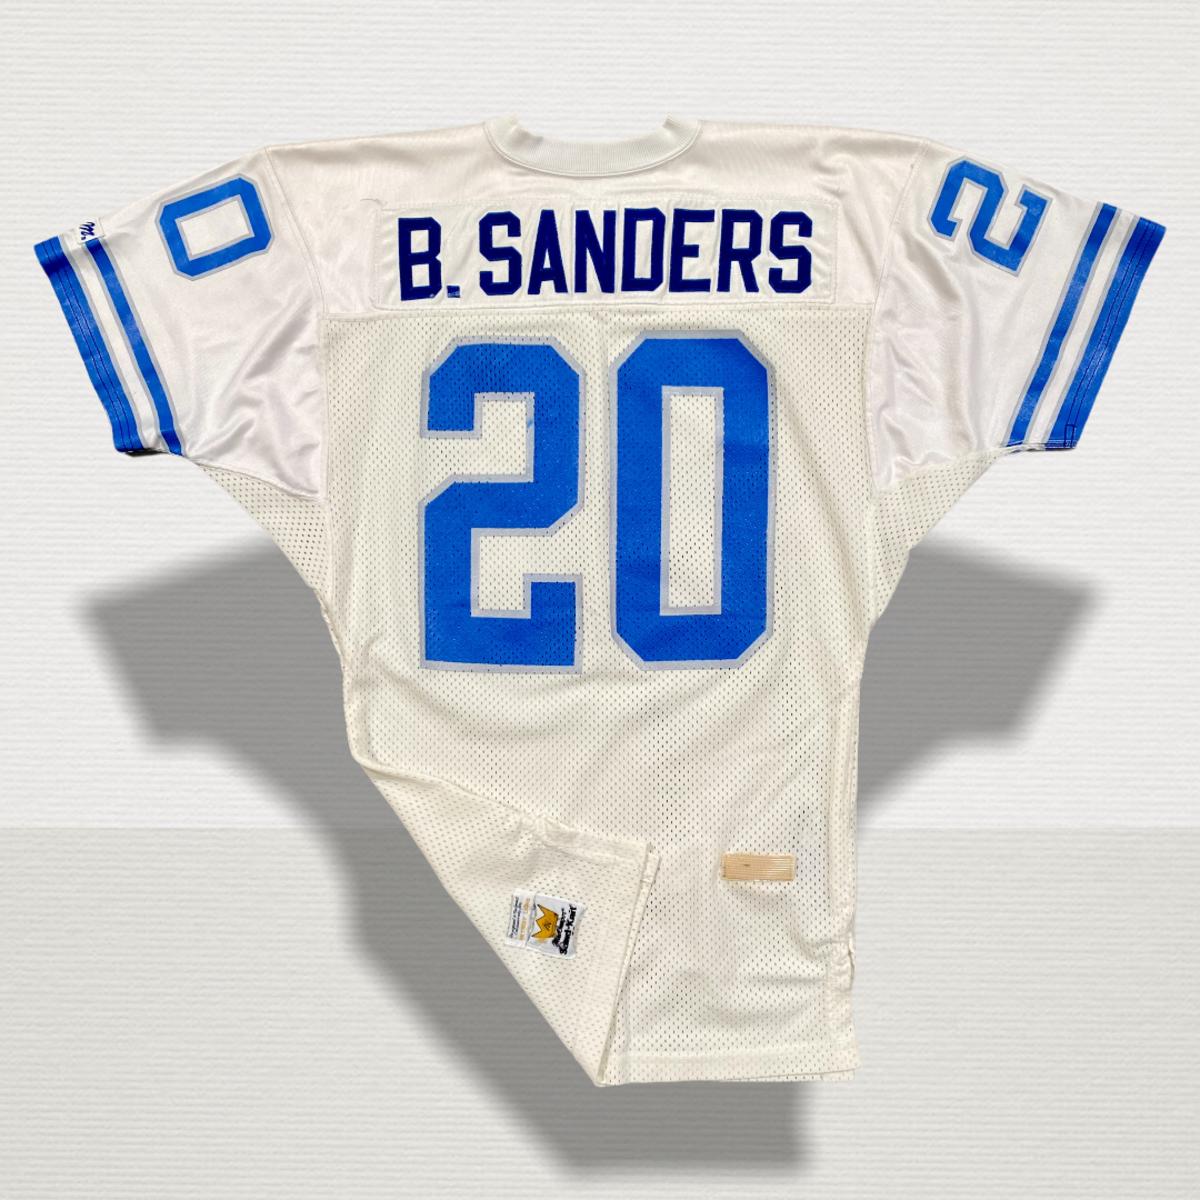 1990 game-worn Barry Sanders jersey.